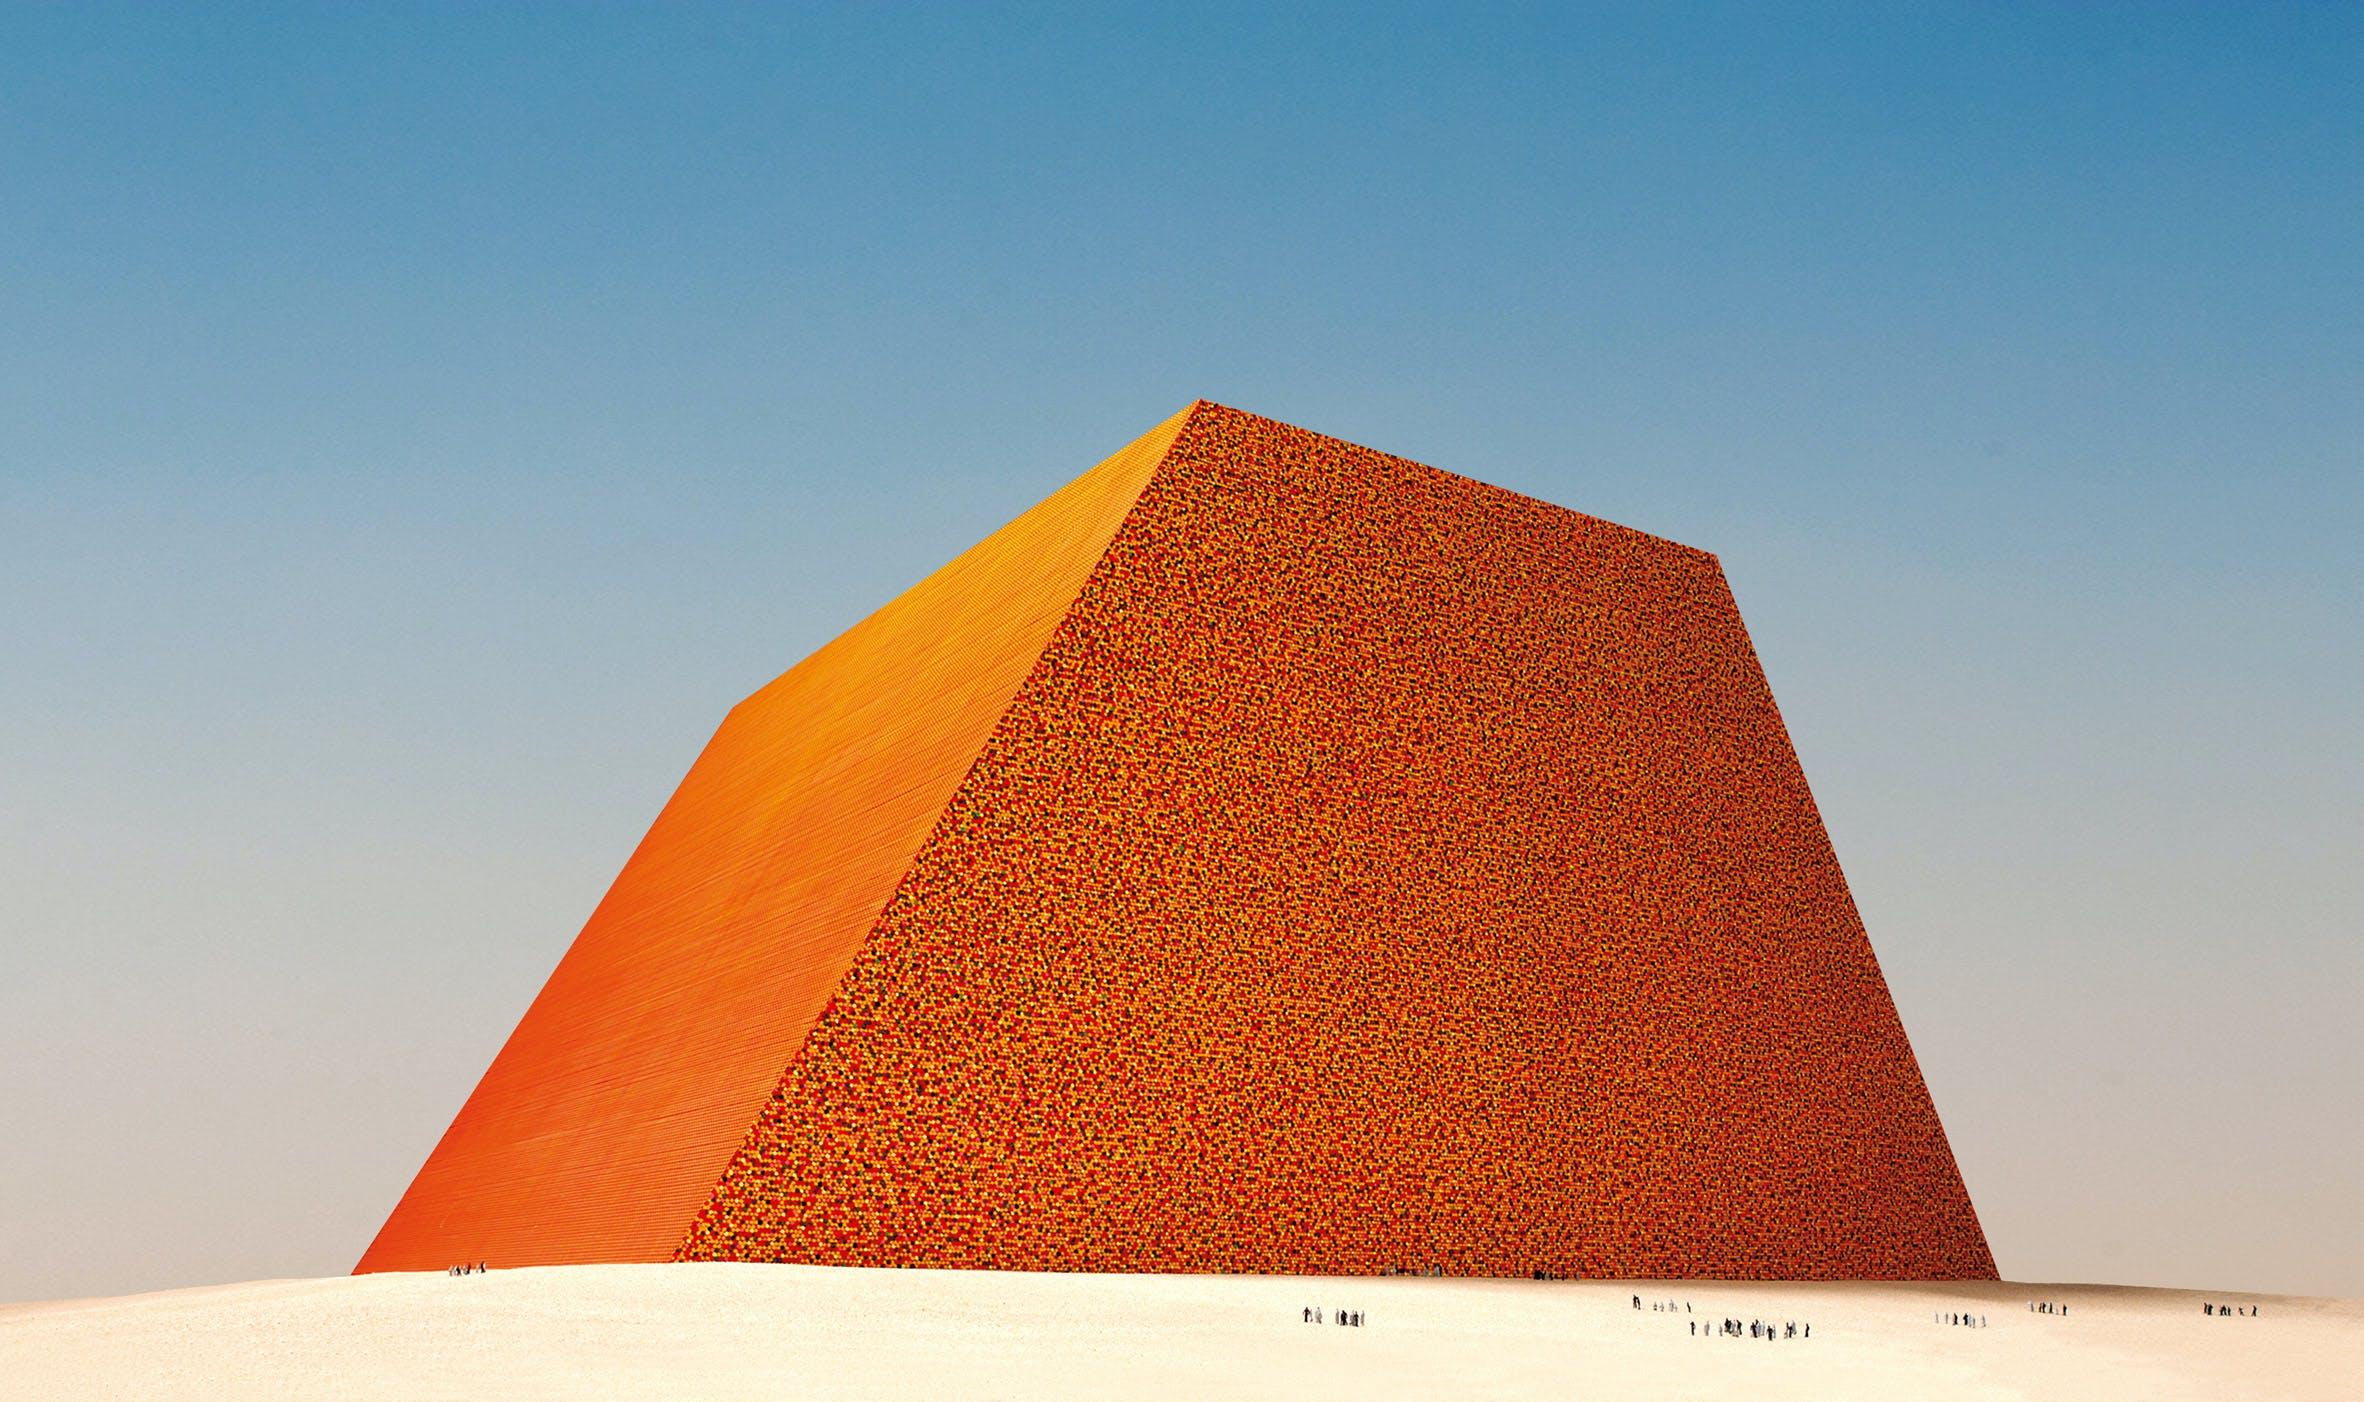 Scale model of The Mastaba for Abu Dhabi, unbuilt.